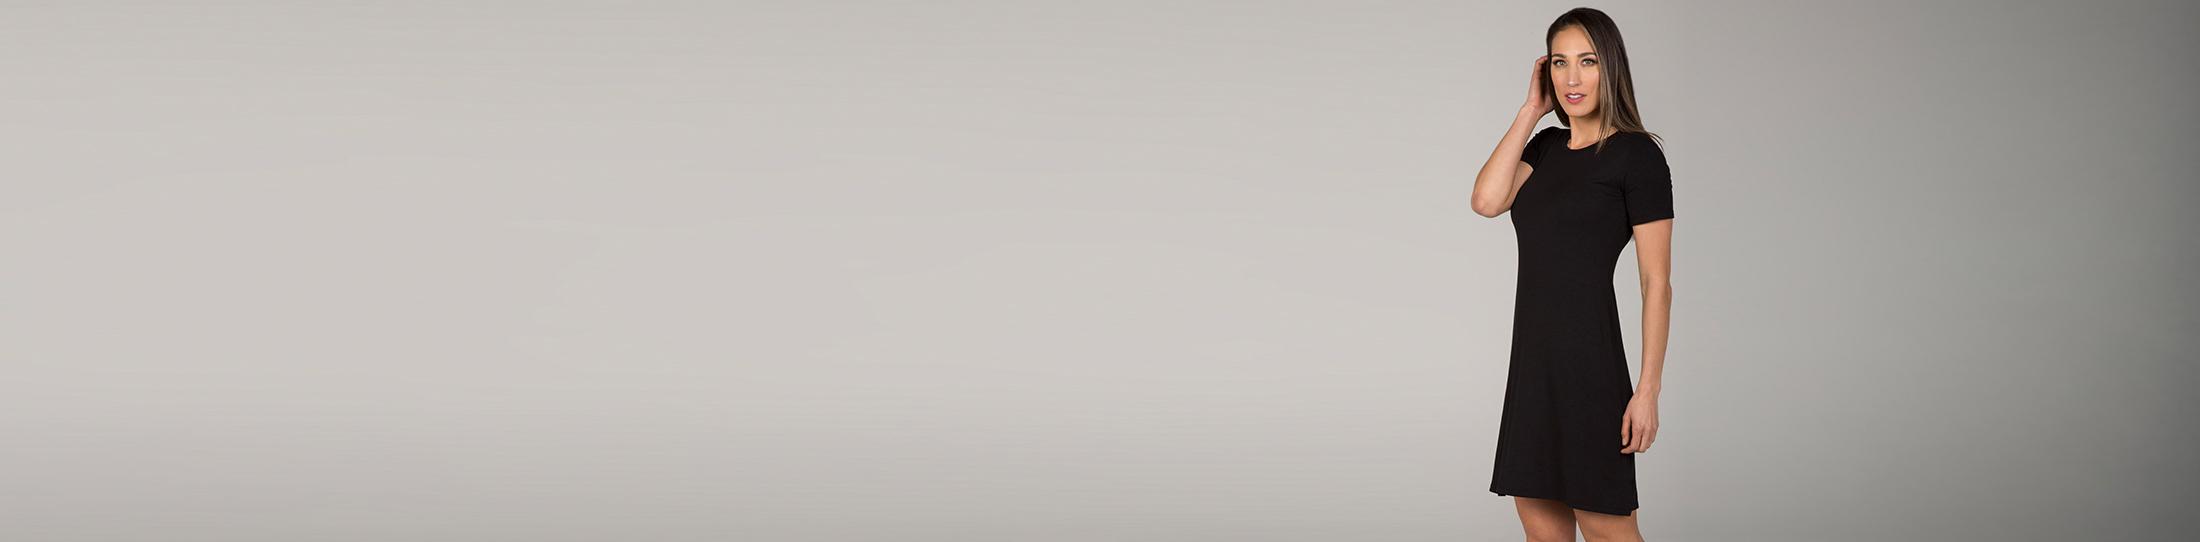 product-category-banner-tshirt-dress-black.jpg